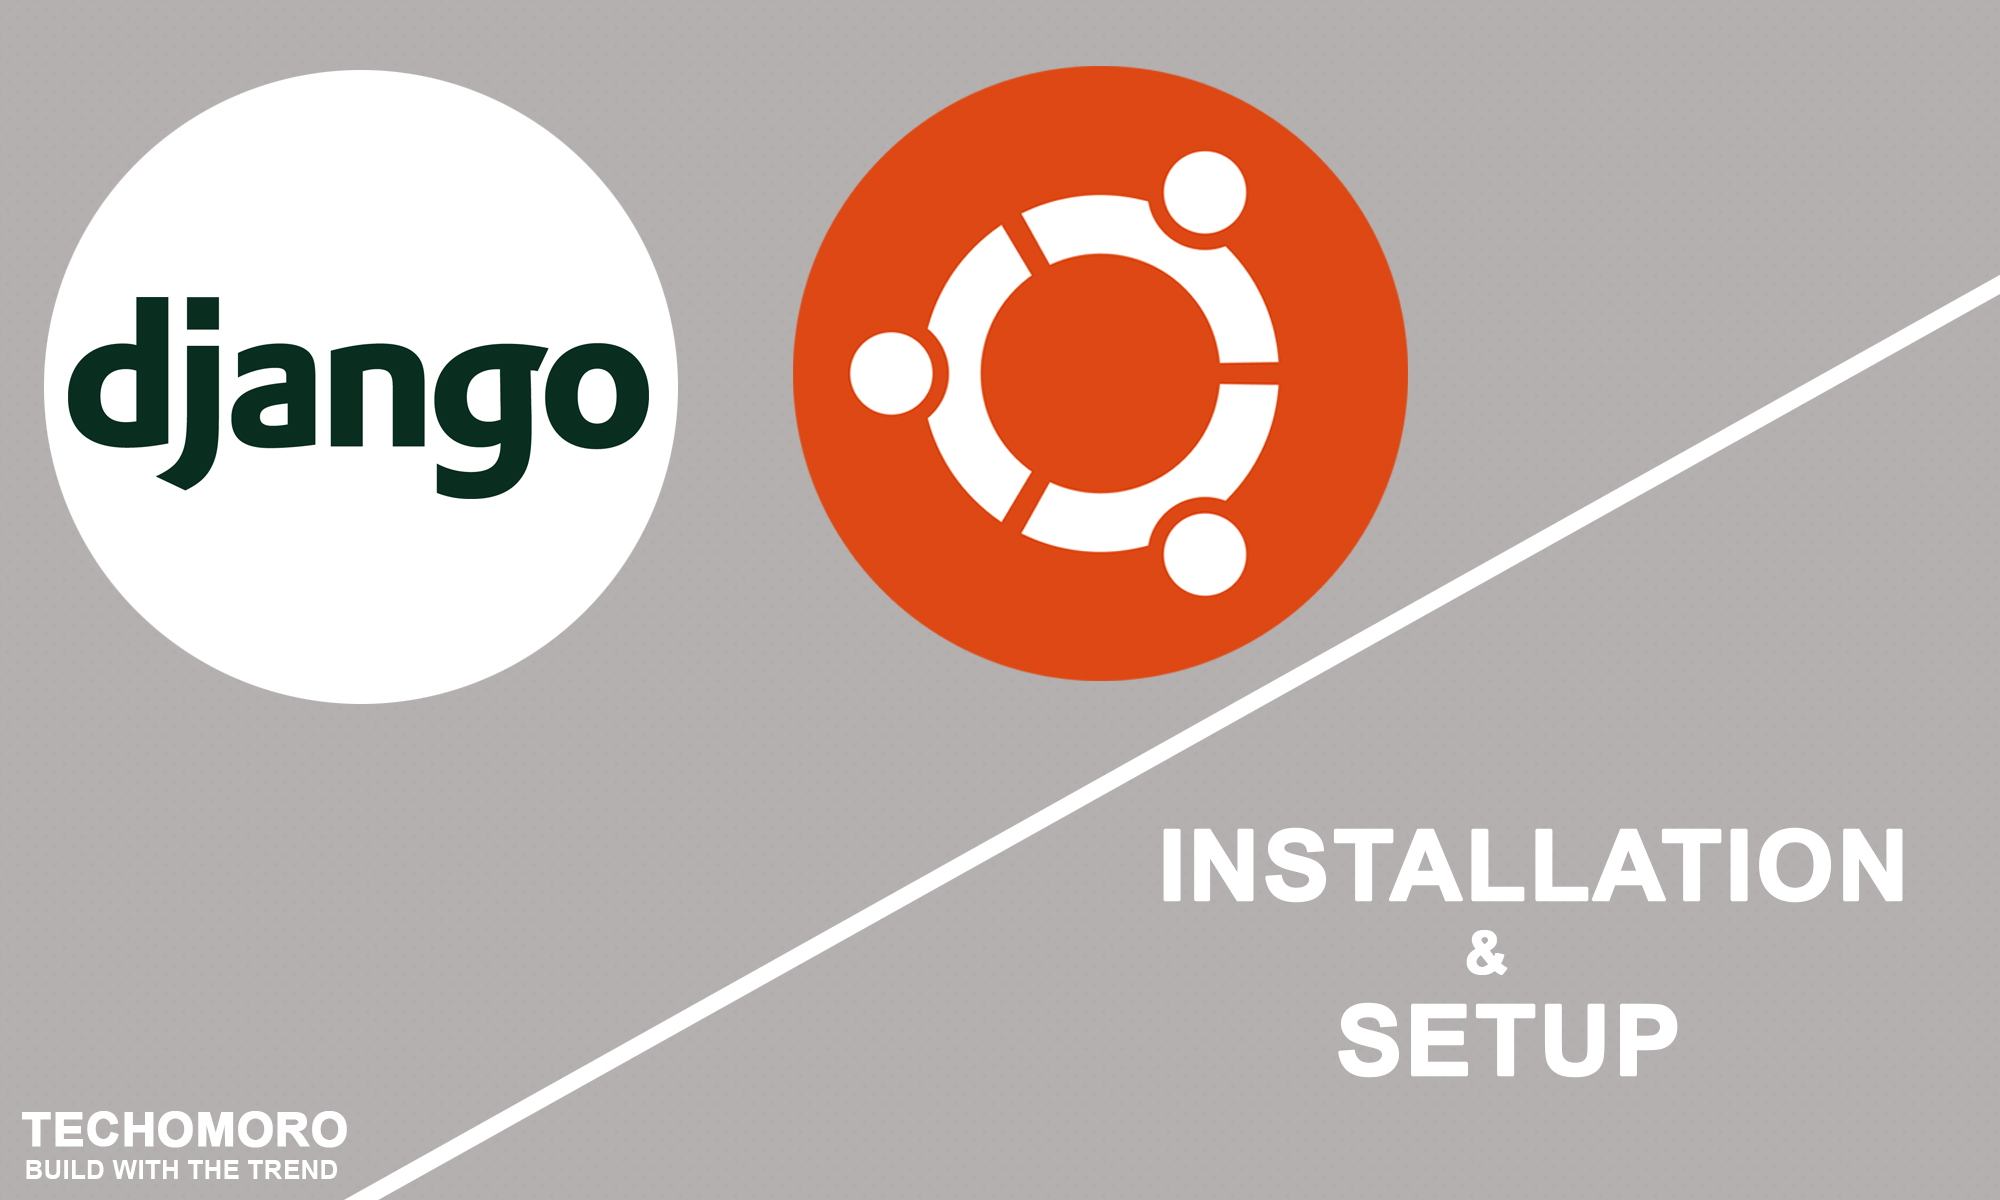 How to Install and Setup Django on Ubuntu 18.04.1 LTS (Bionic Beaver)